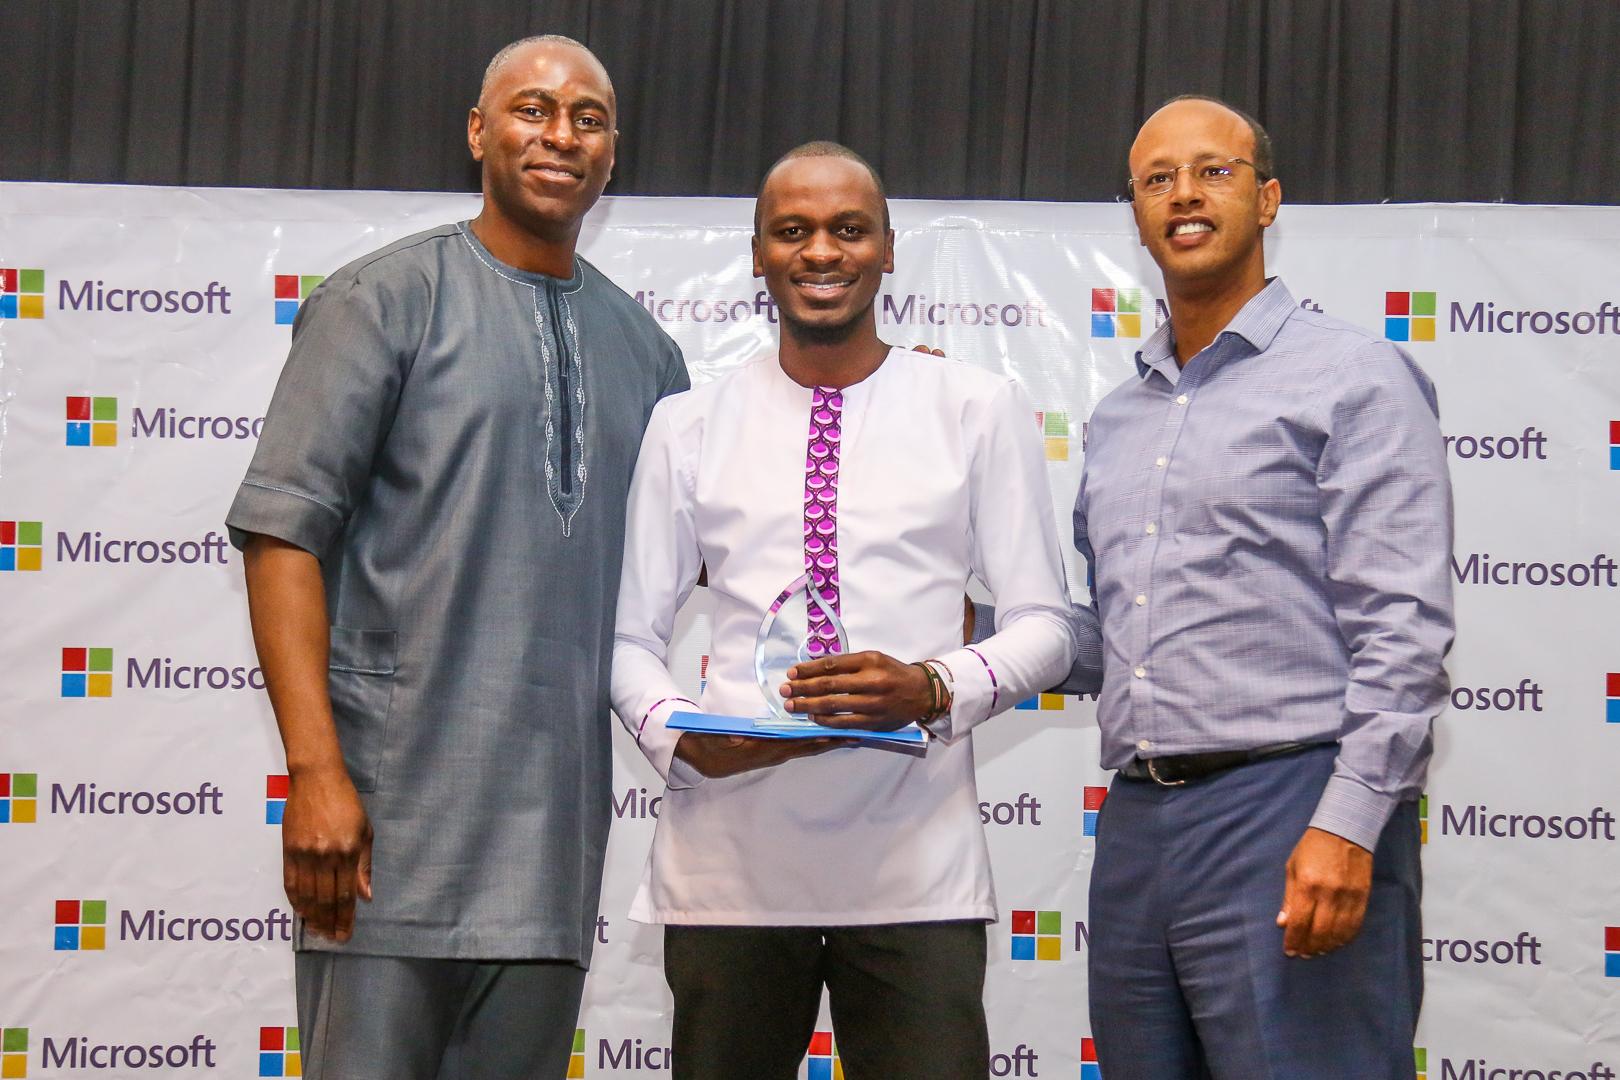 microsoft celebrates graduation of insiders4good east africa fellows